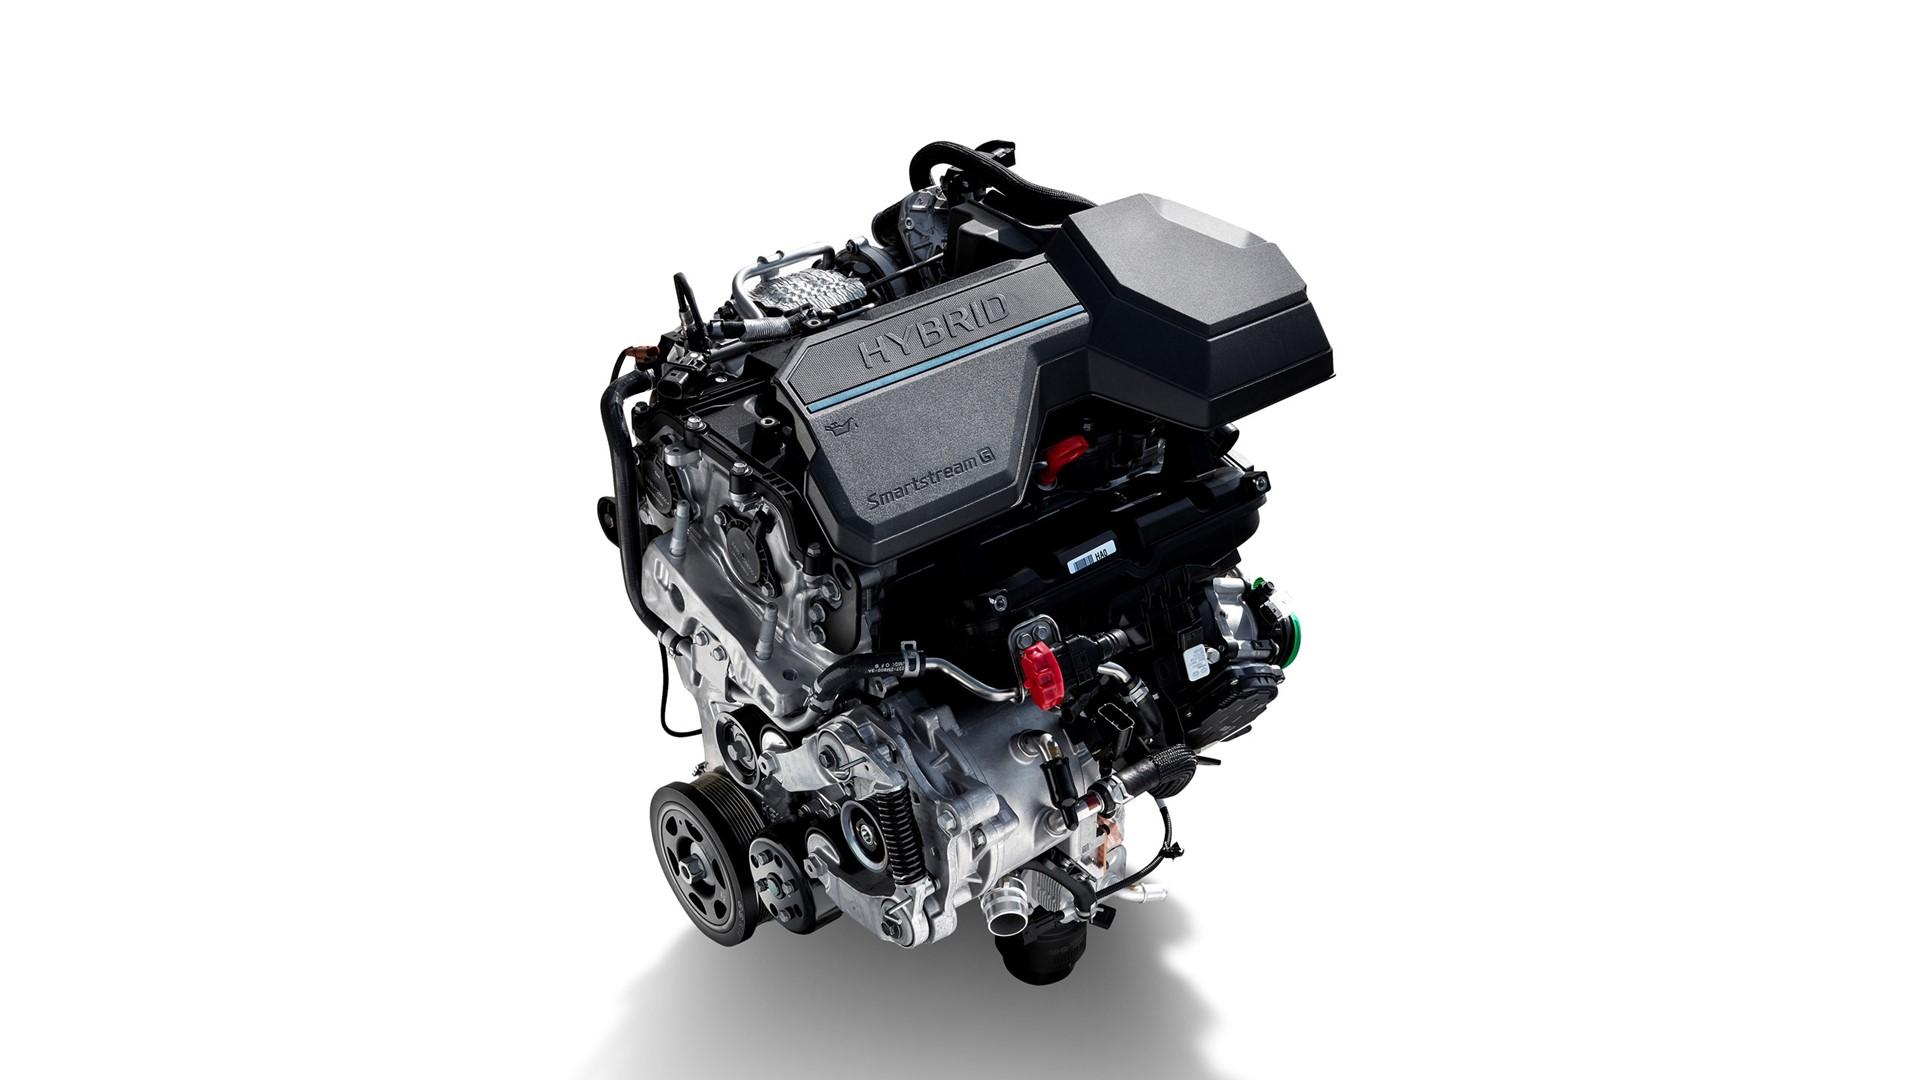 Kia announces new platform and powertrain details for next-generation Sorento - Image 1